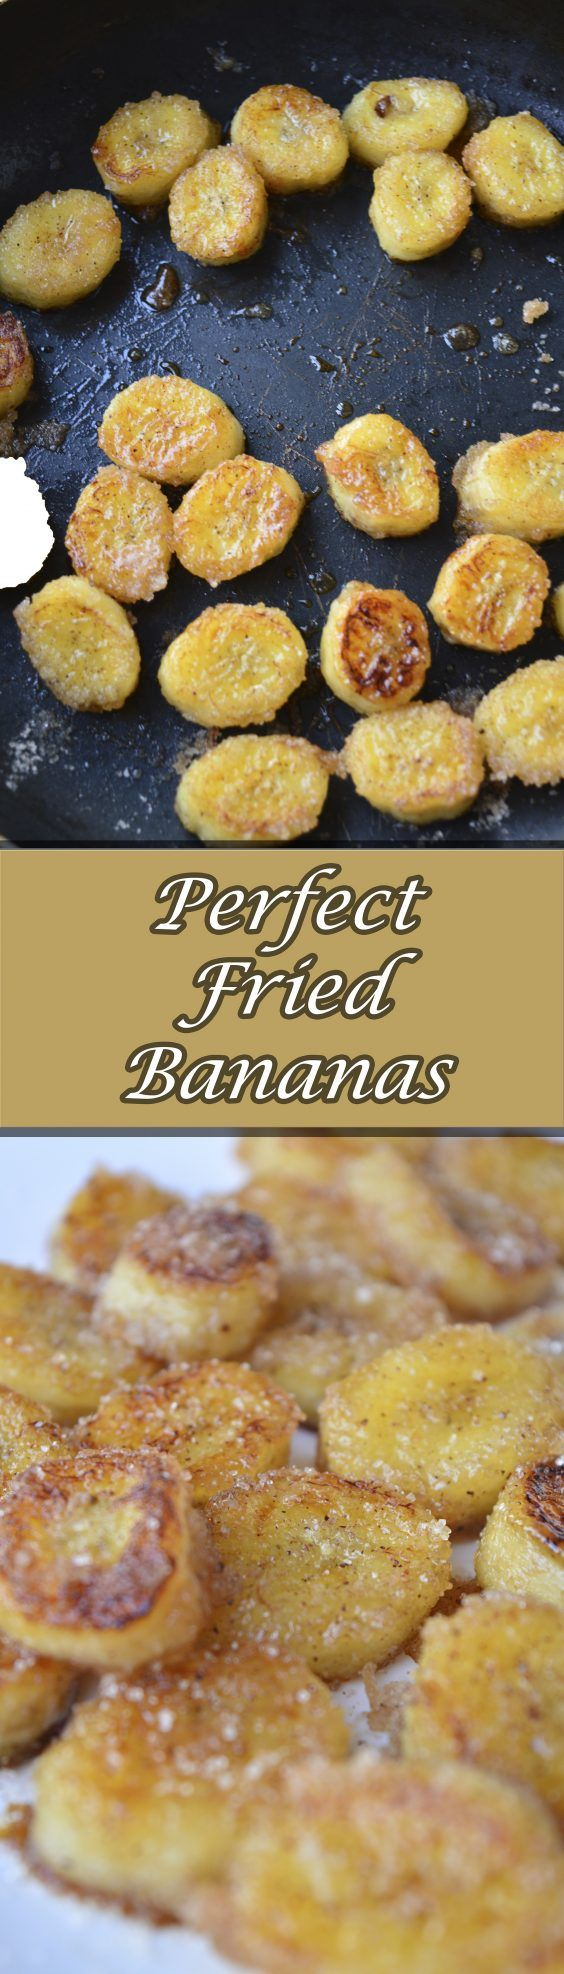 Perfect fried bananas